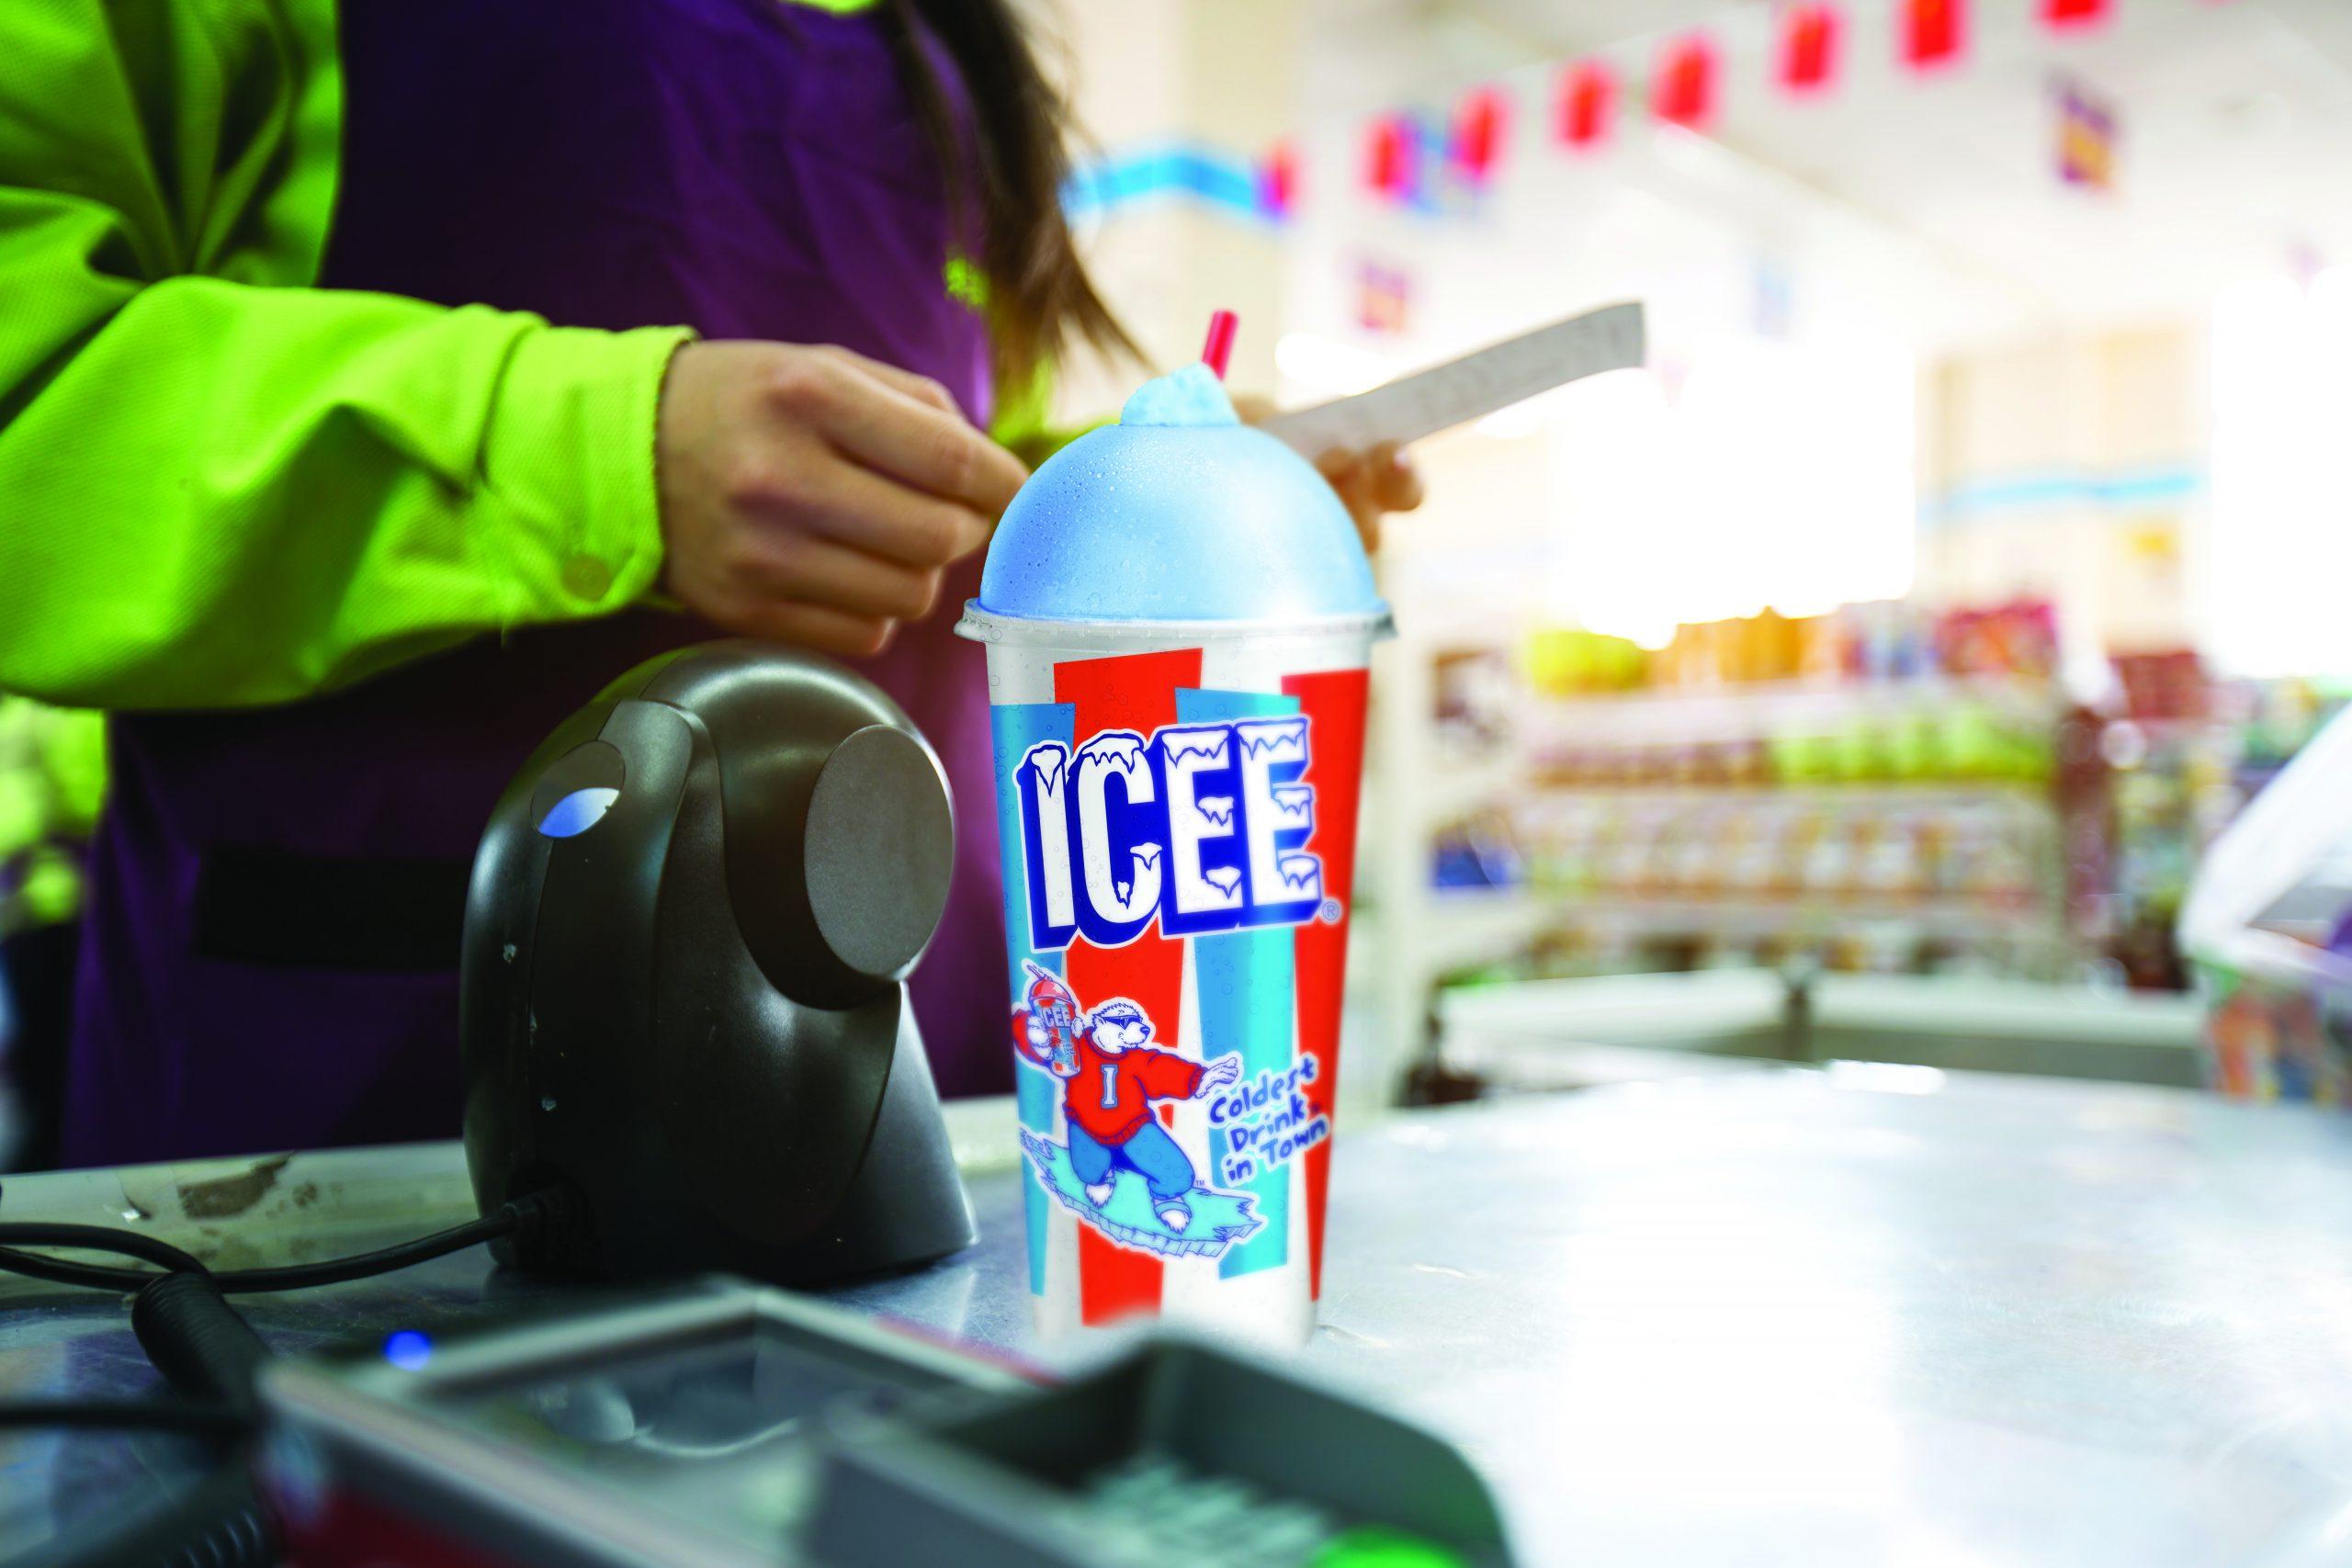 20-ICEECO-0197 ICEE Food Service Images ICEE Grocery P1